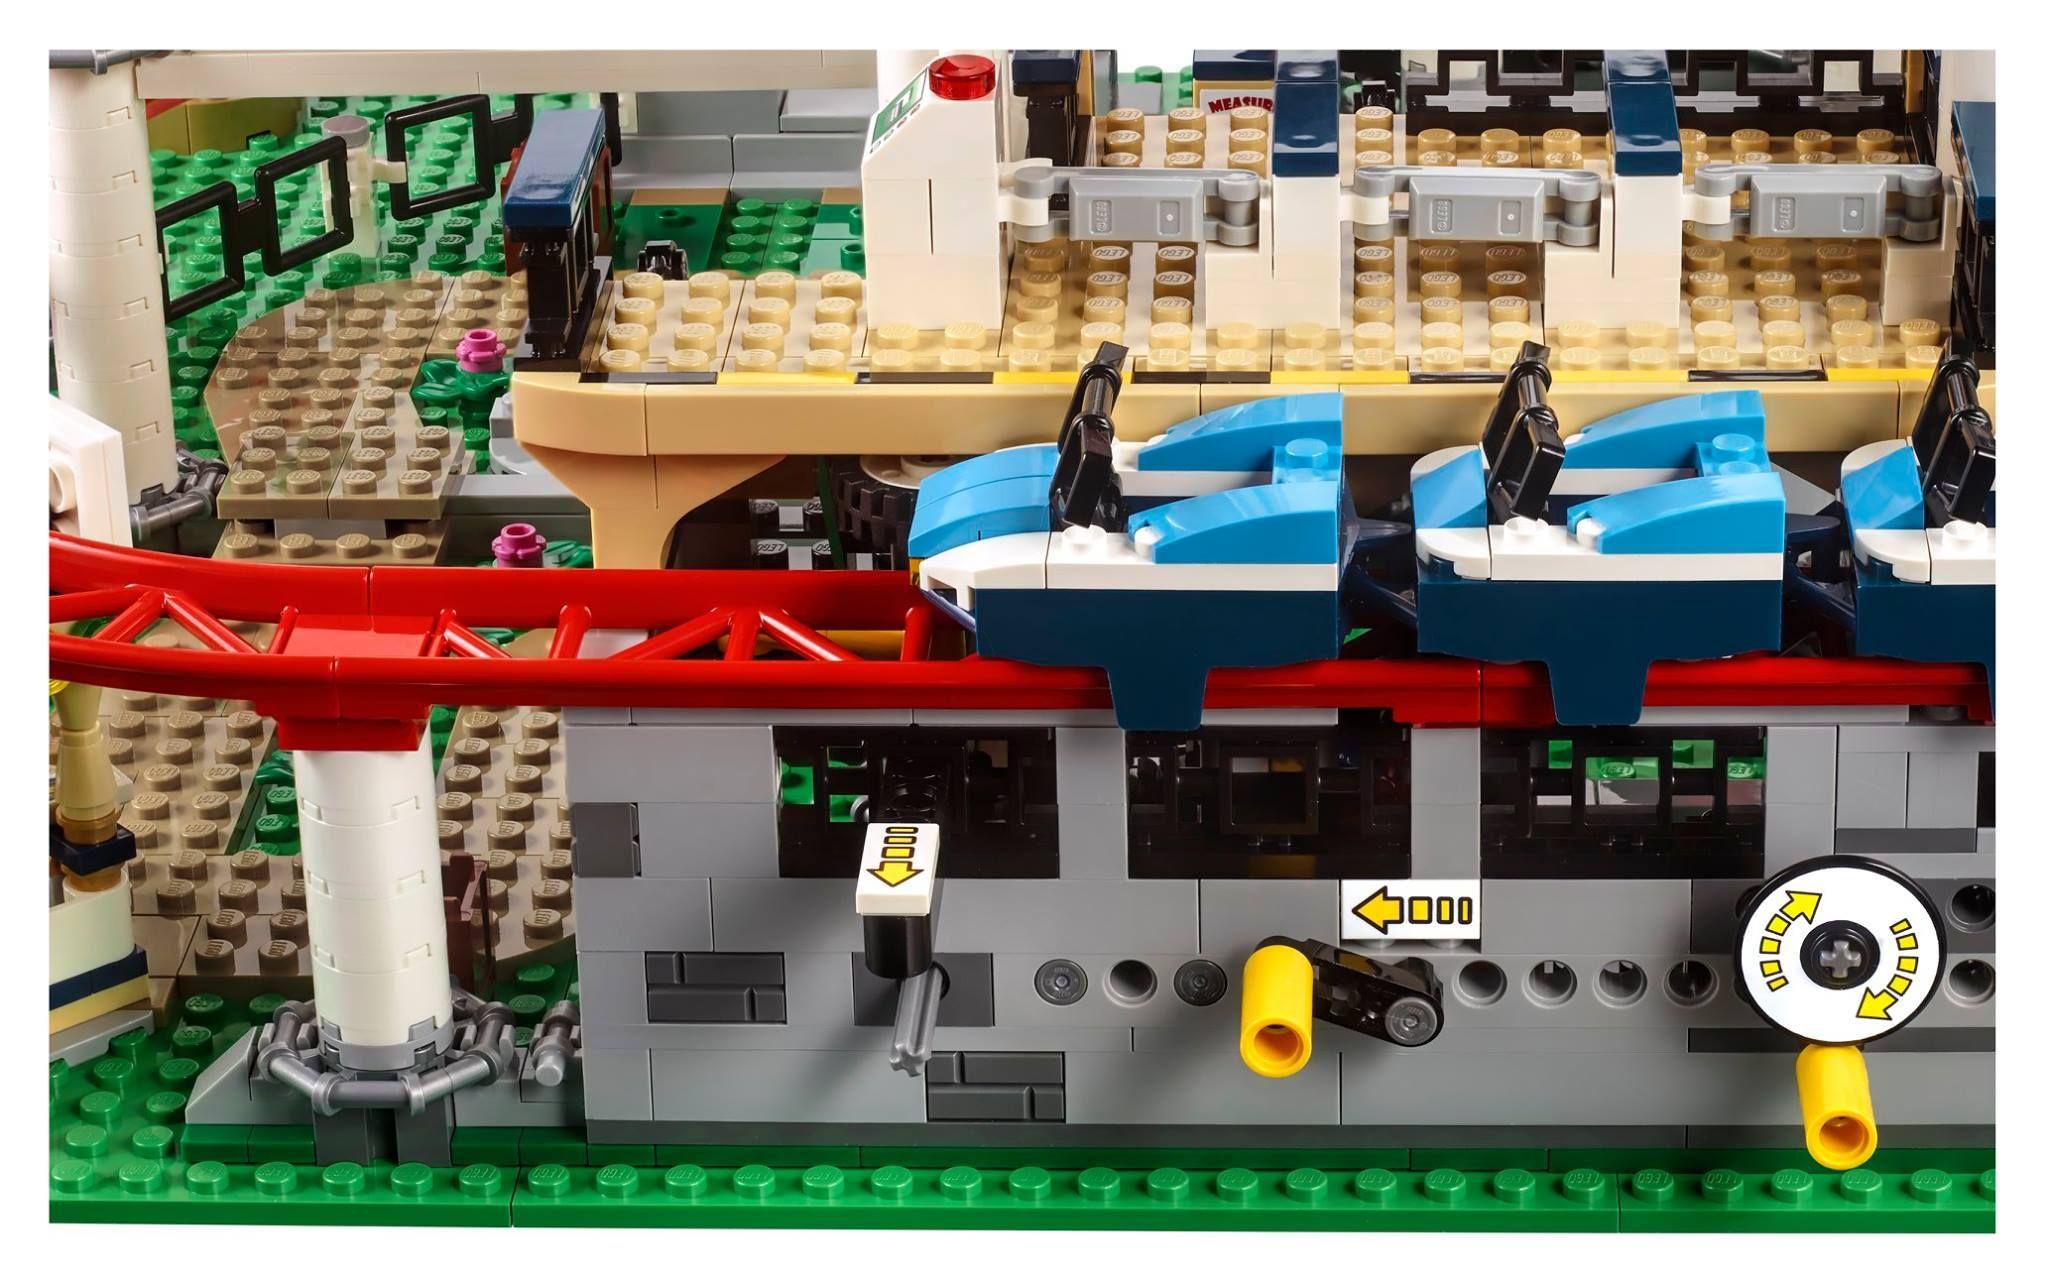 lego 10261 achterbahn creator expert 2018 roller coaster brickmerge. Black Bedroom Furniture Sets. Home Design Ideas